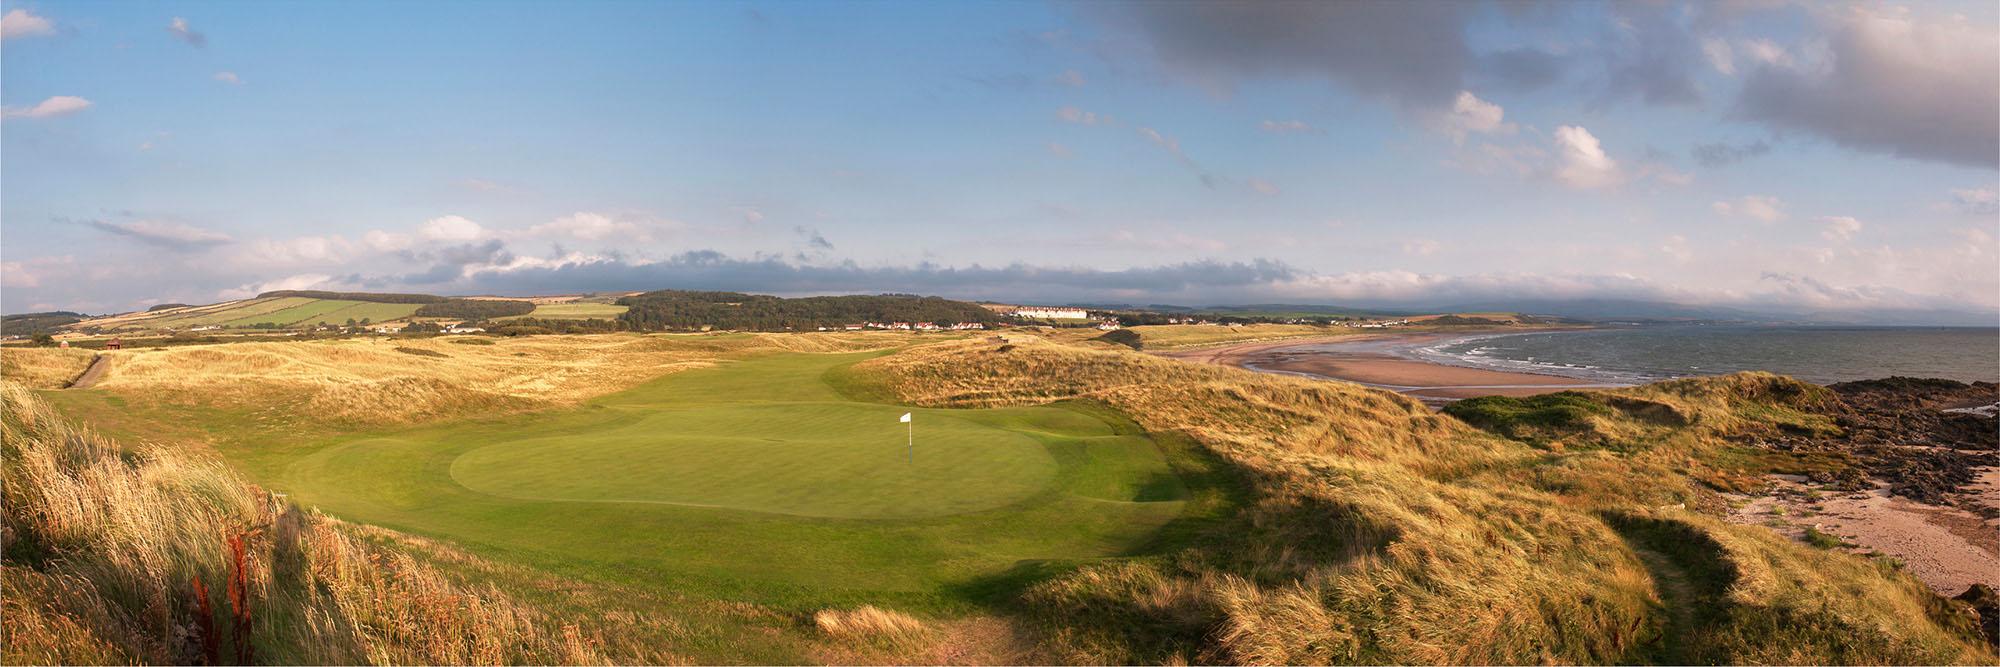 Golf Course Image - Turnberry Ailsa No. 8